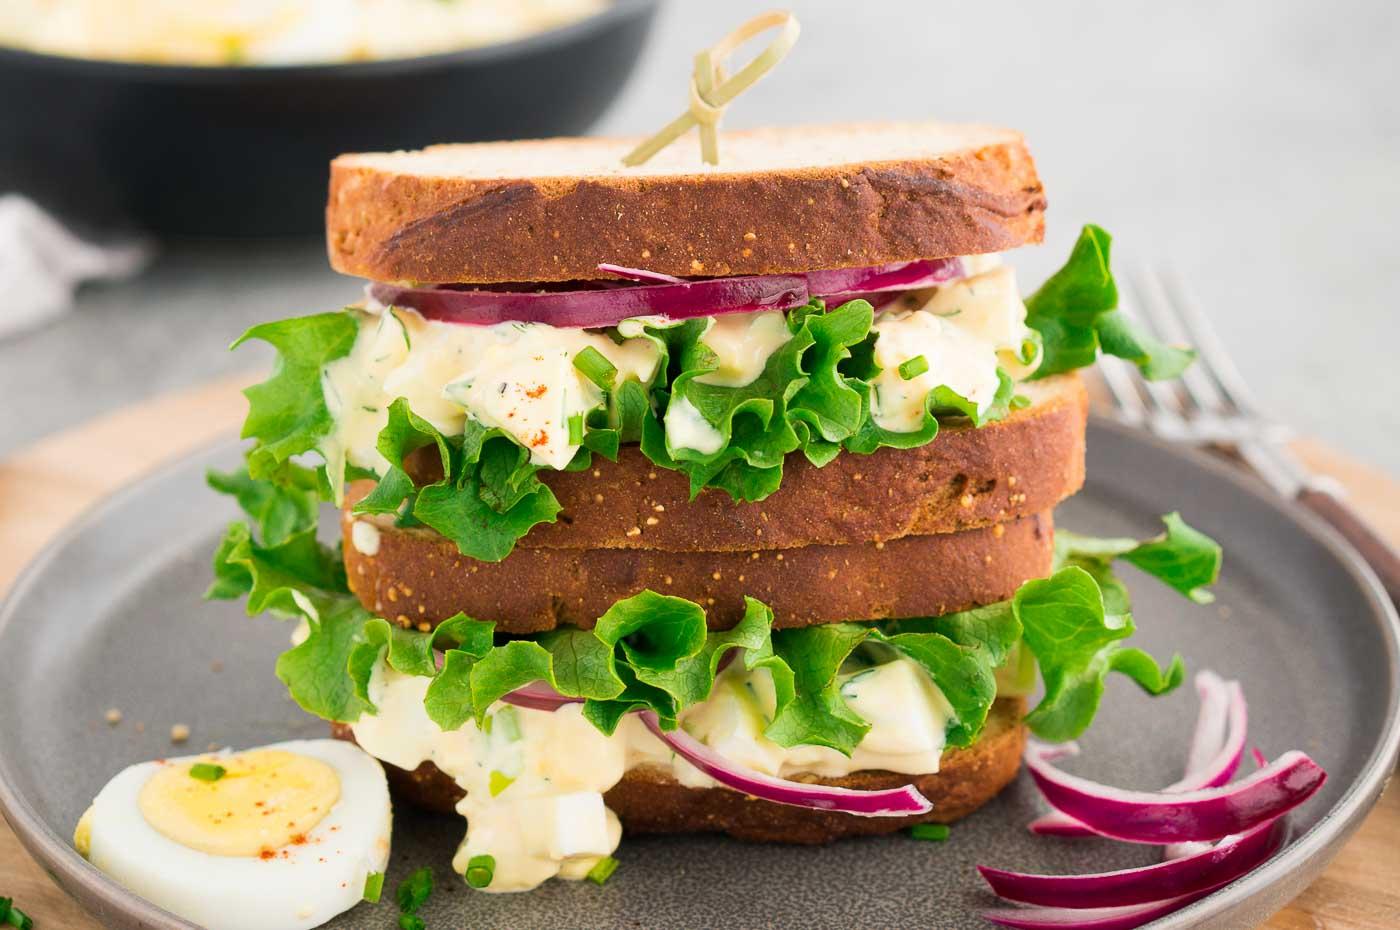 healthy egg sandwich on a plate